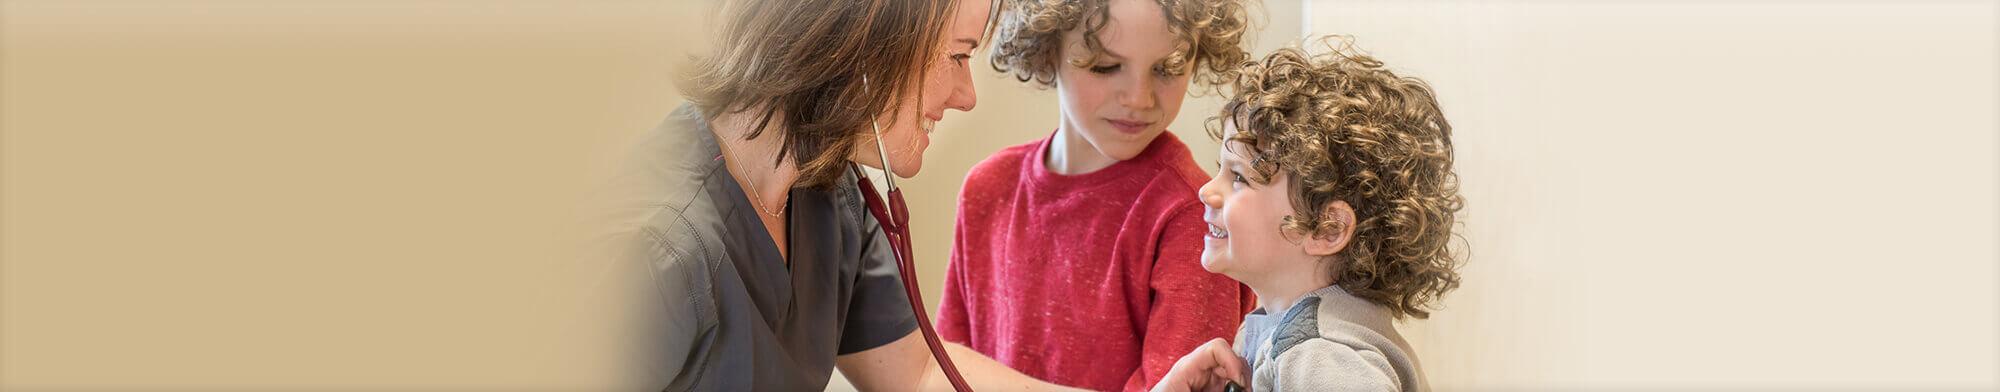 Animas Surgical Hospital - Walk-in Emergency Clinic Durango, CO